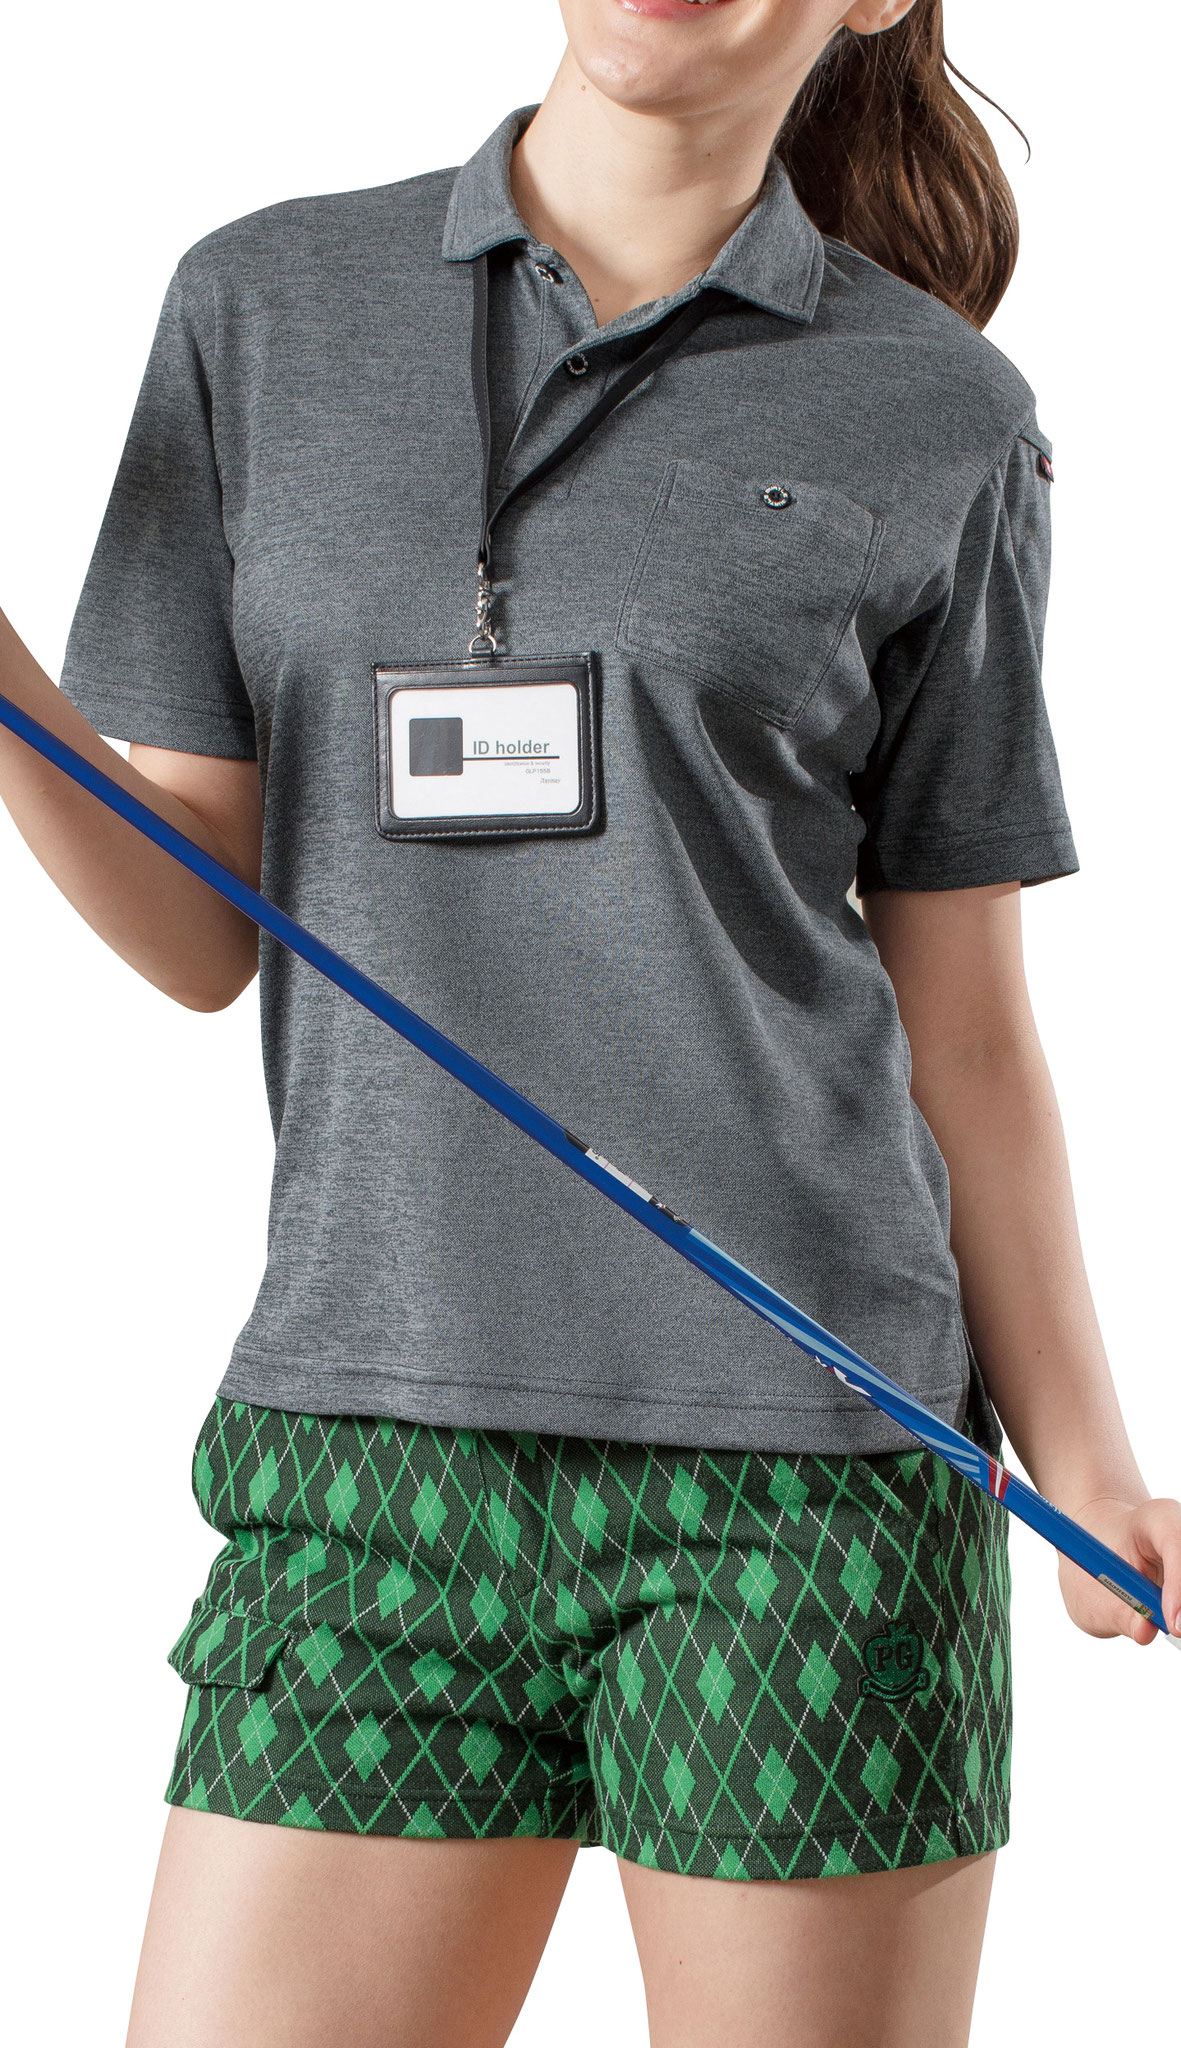 BURTLE~バートル~667 半袖ポロシャツ ¥990(税込)